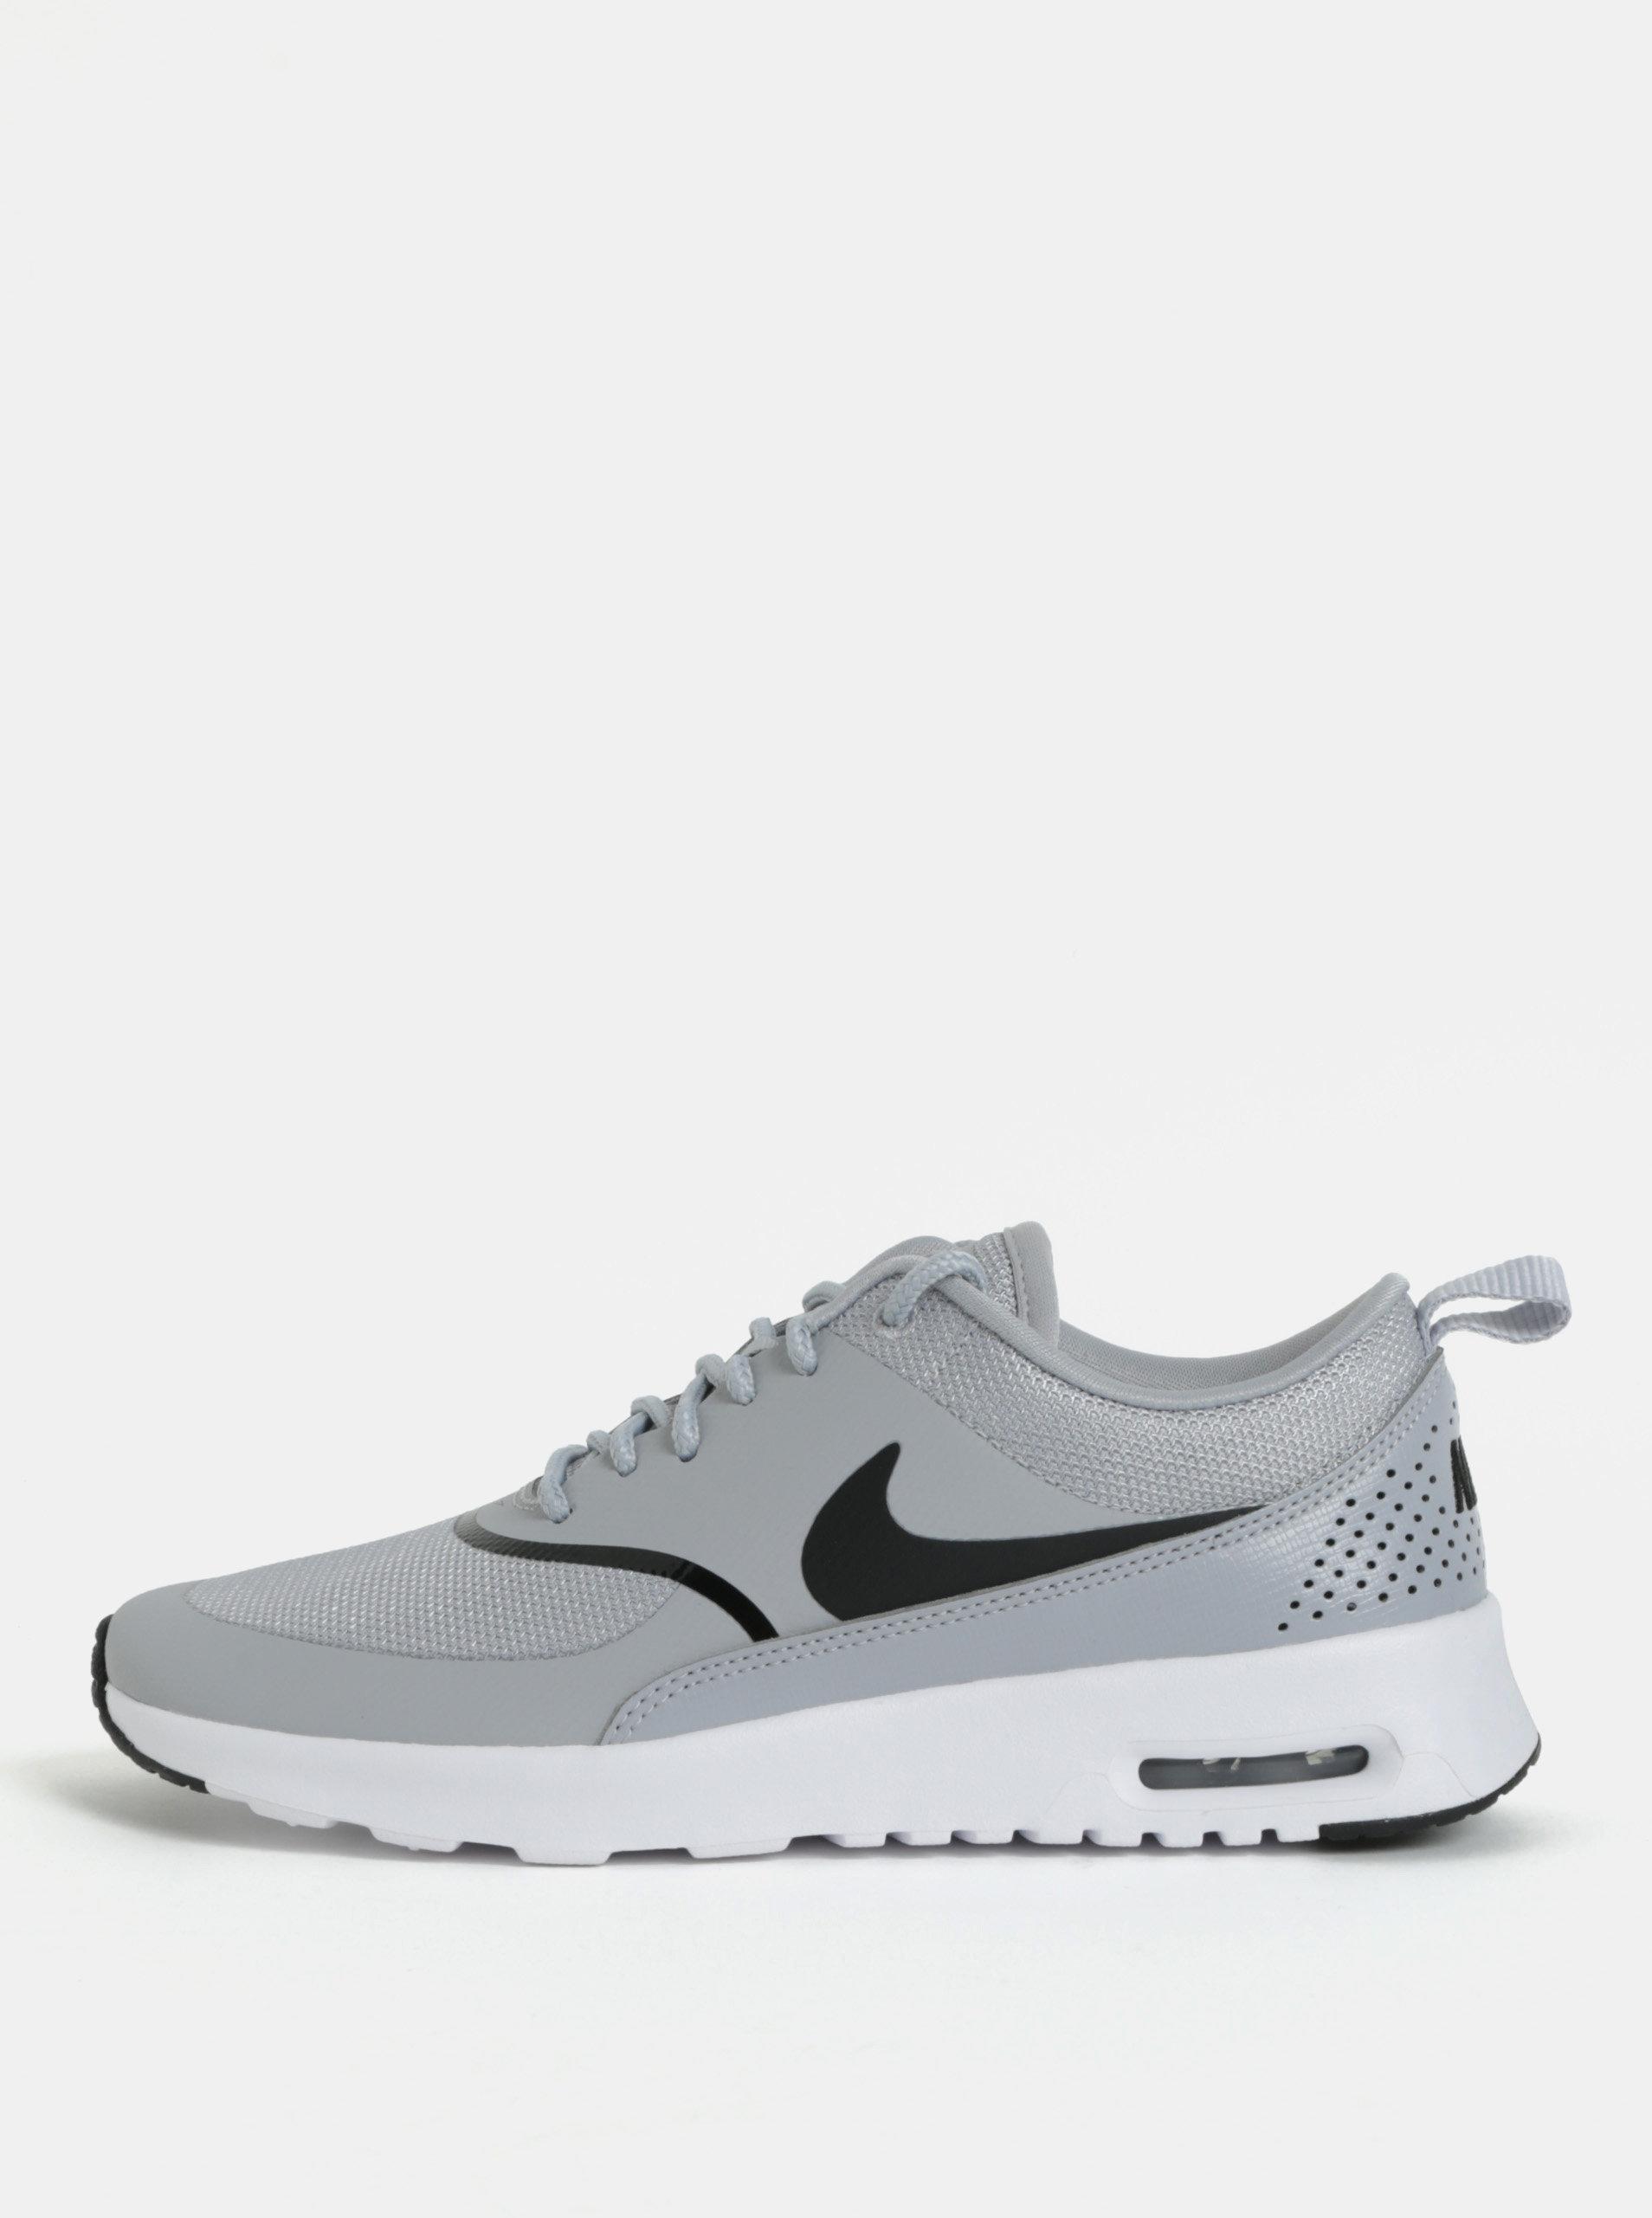 Šedé dámské tenisky Nike Air Max Thea ... f50fb840a24